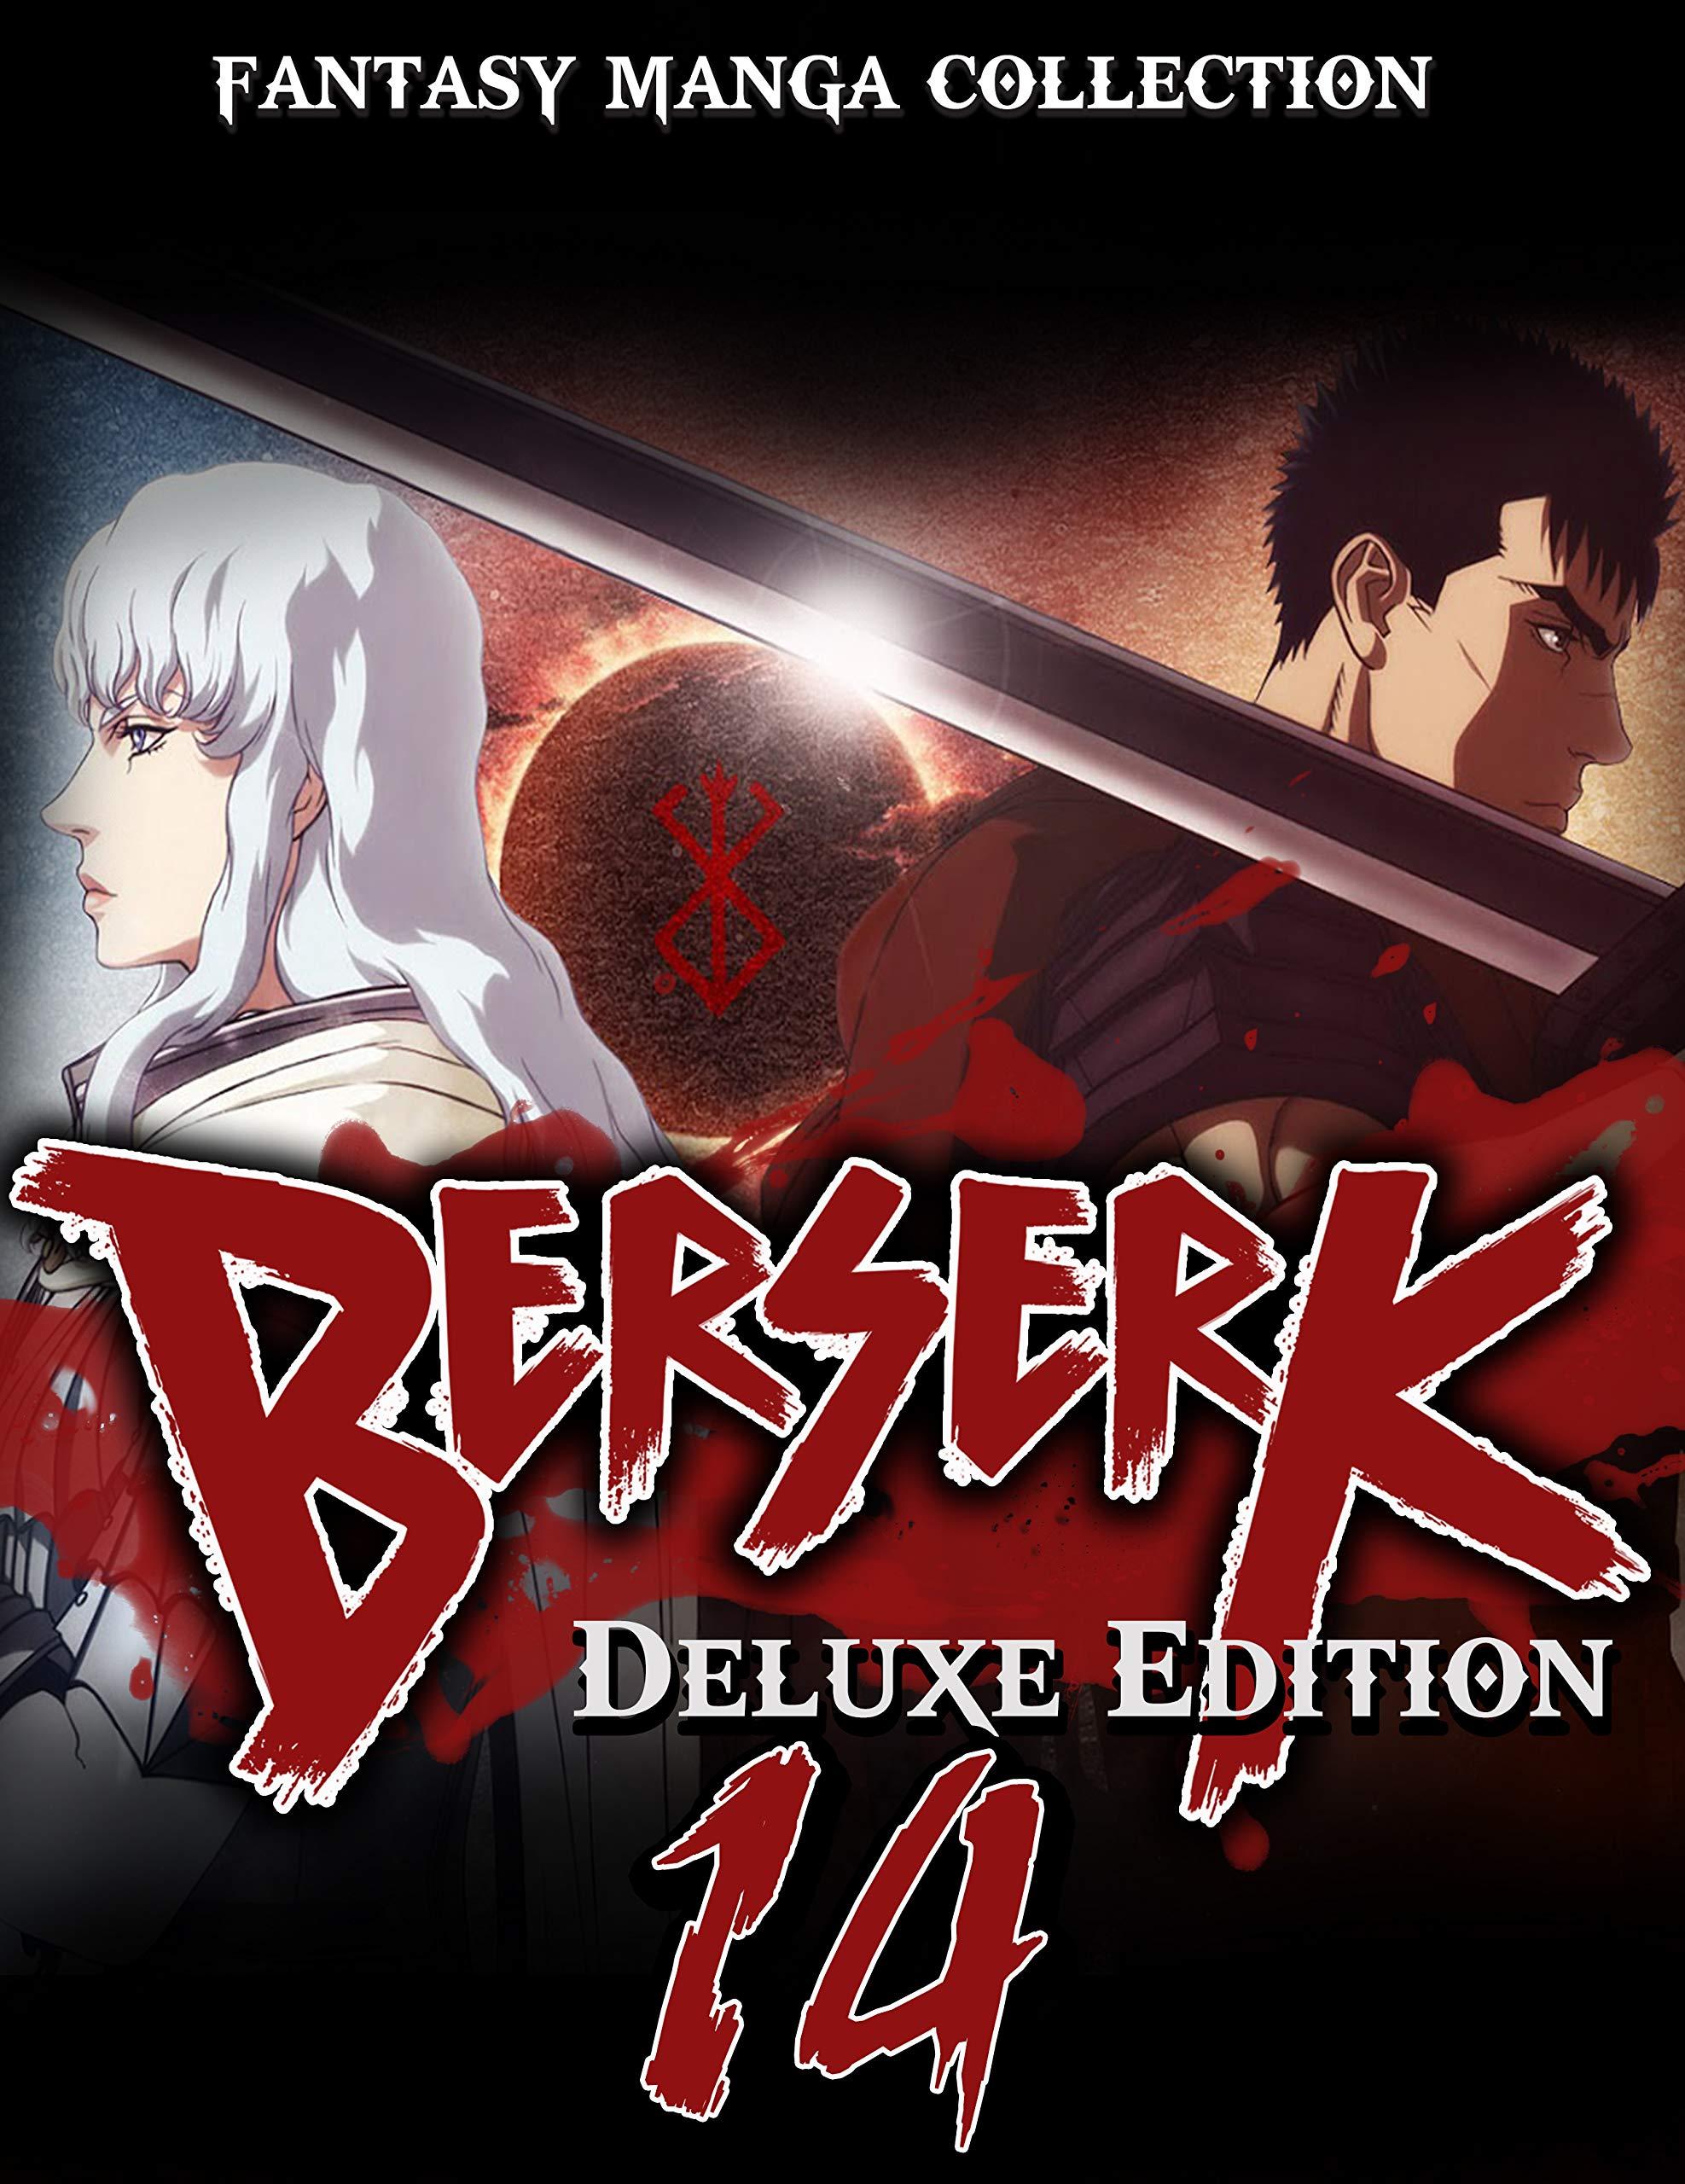 Best Fantasy Manga Collection Full Series Berserk: Full Deluxe Edition Vol 14